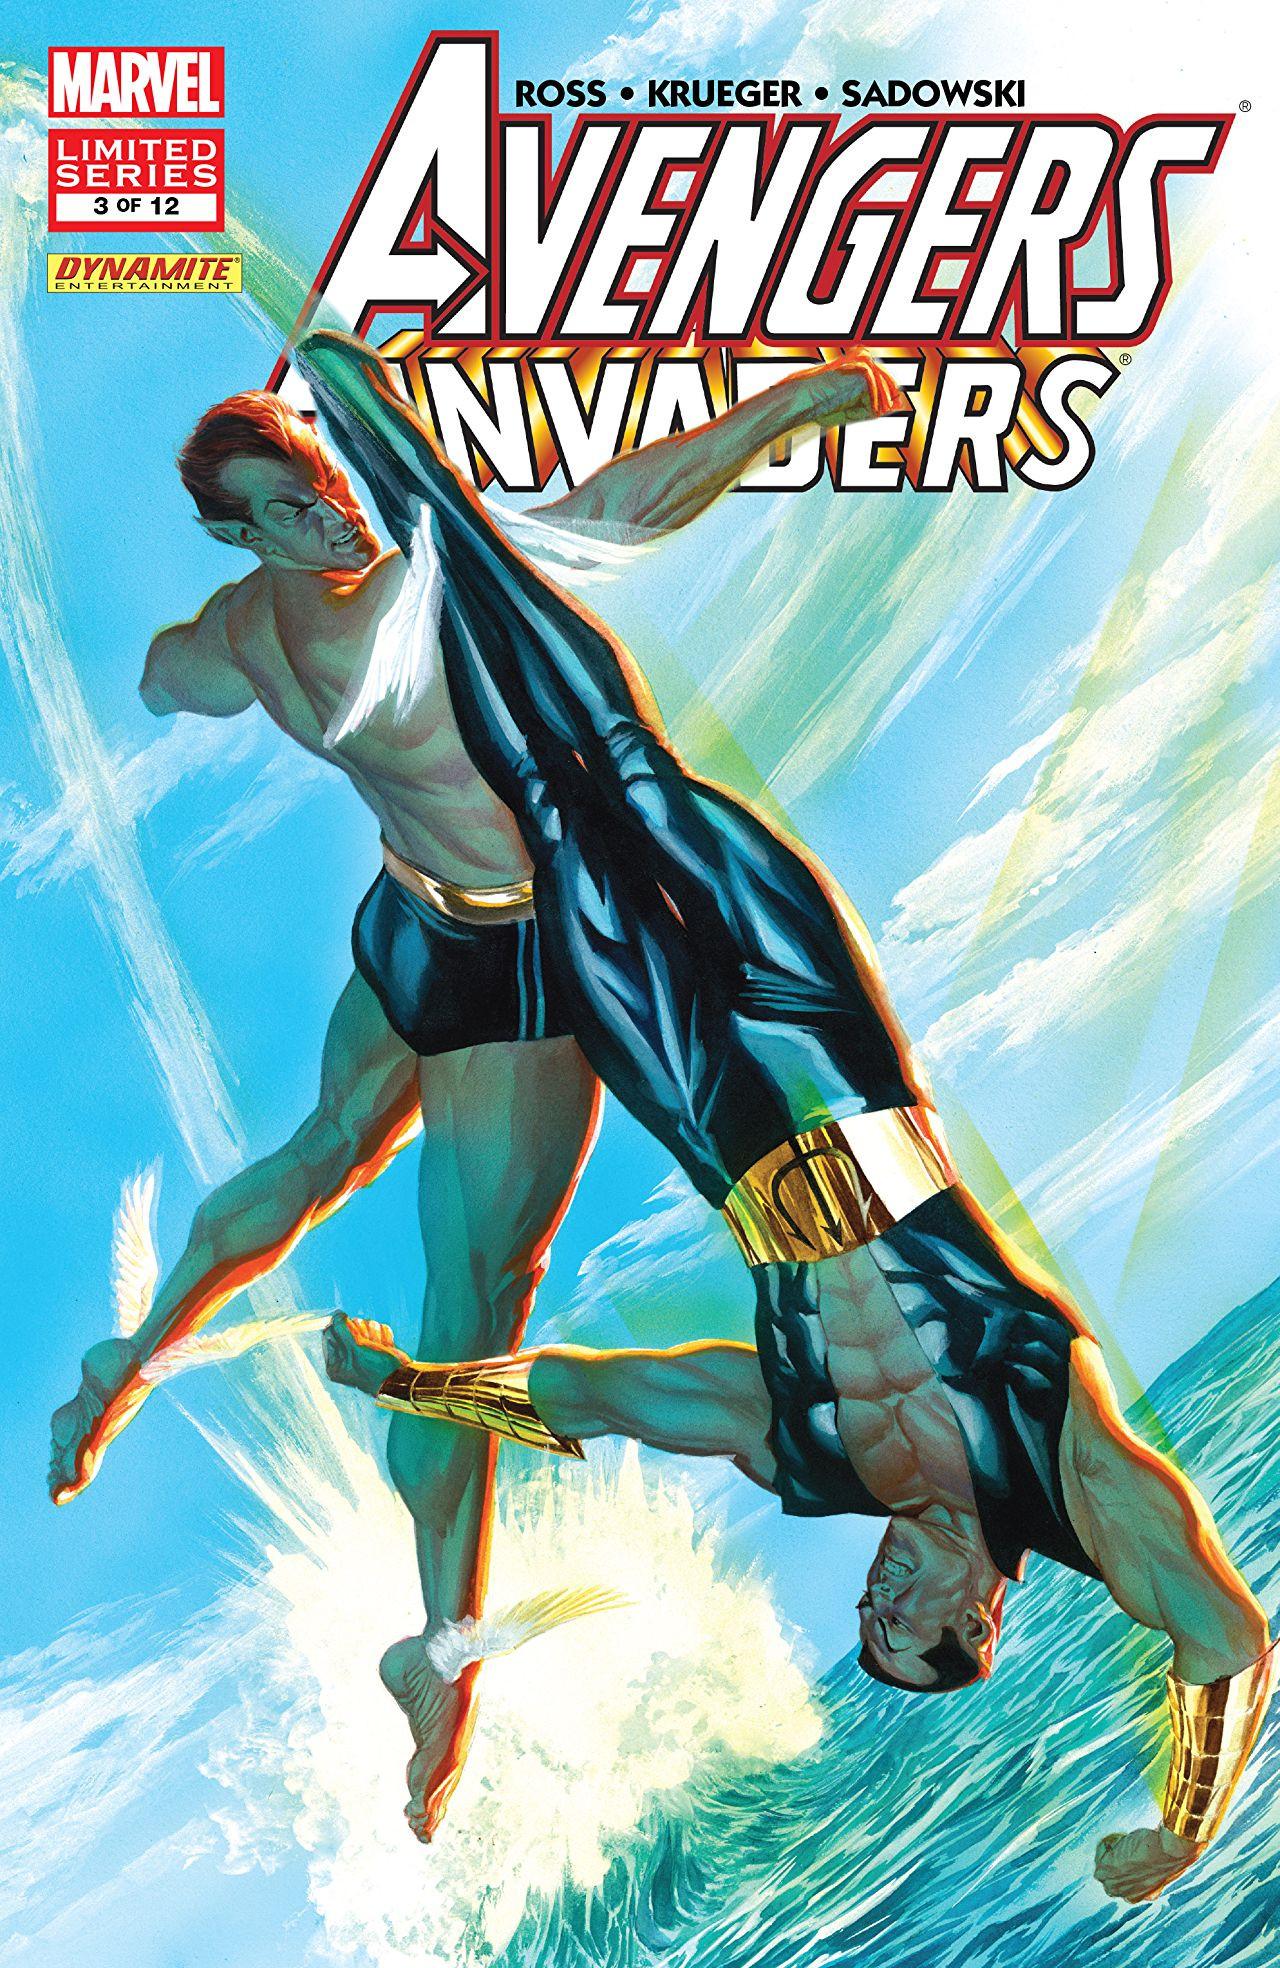 Avengers / Invaders Vol 1 3